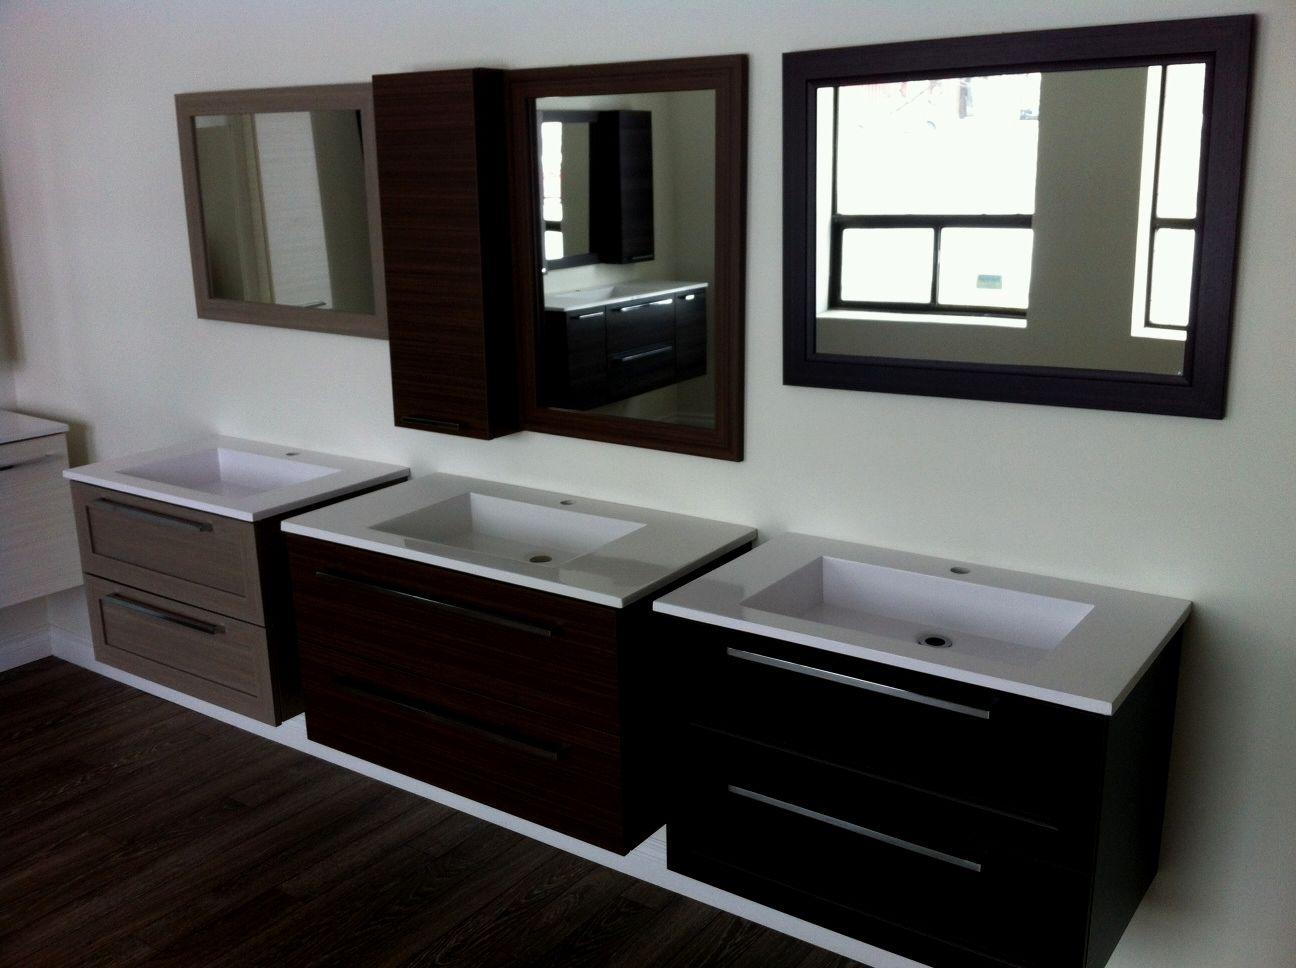 lovely bathroom vanities with tops pattern-Beautiful Bathroom Vanities with tops Photograph